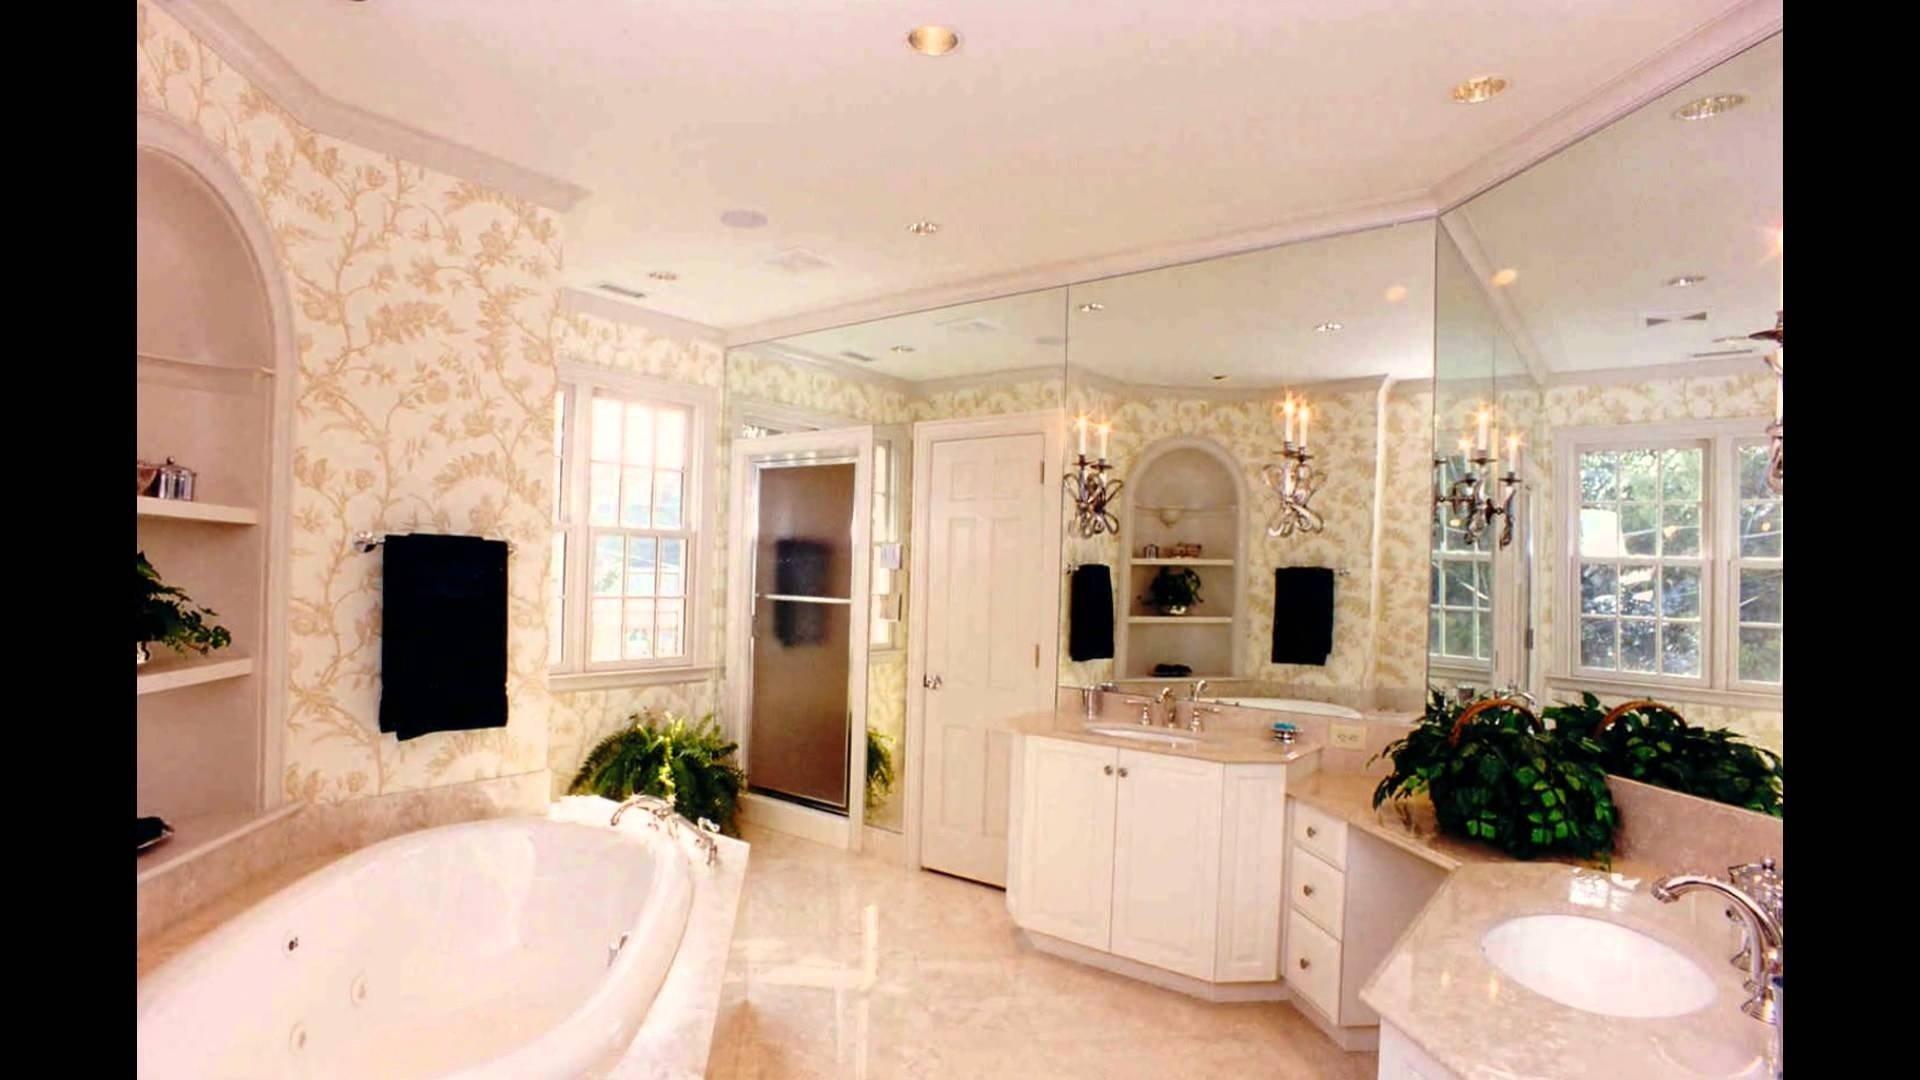 10 Stylish Master Bedroom And Bathroom Ideas master bathroom designs master bedroom bathroom designs youtube 2021